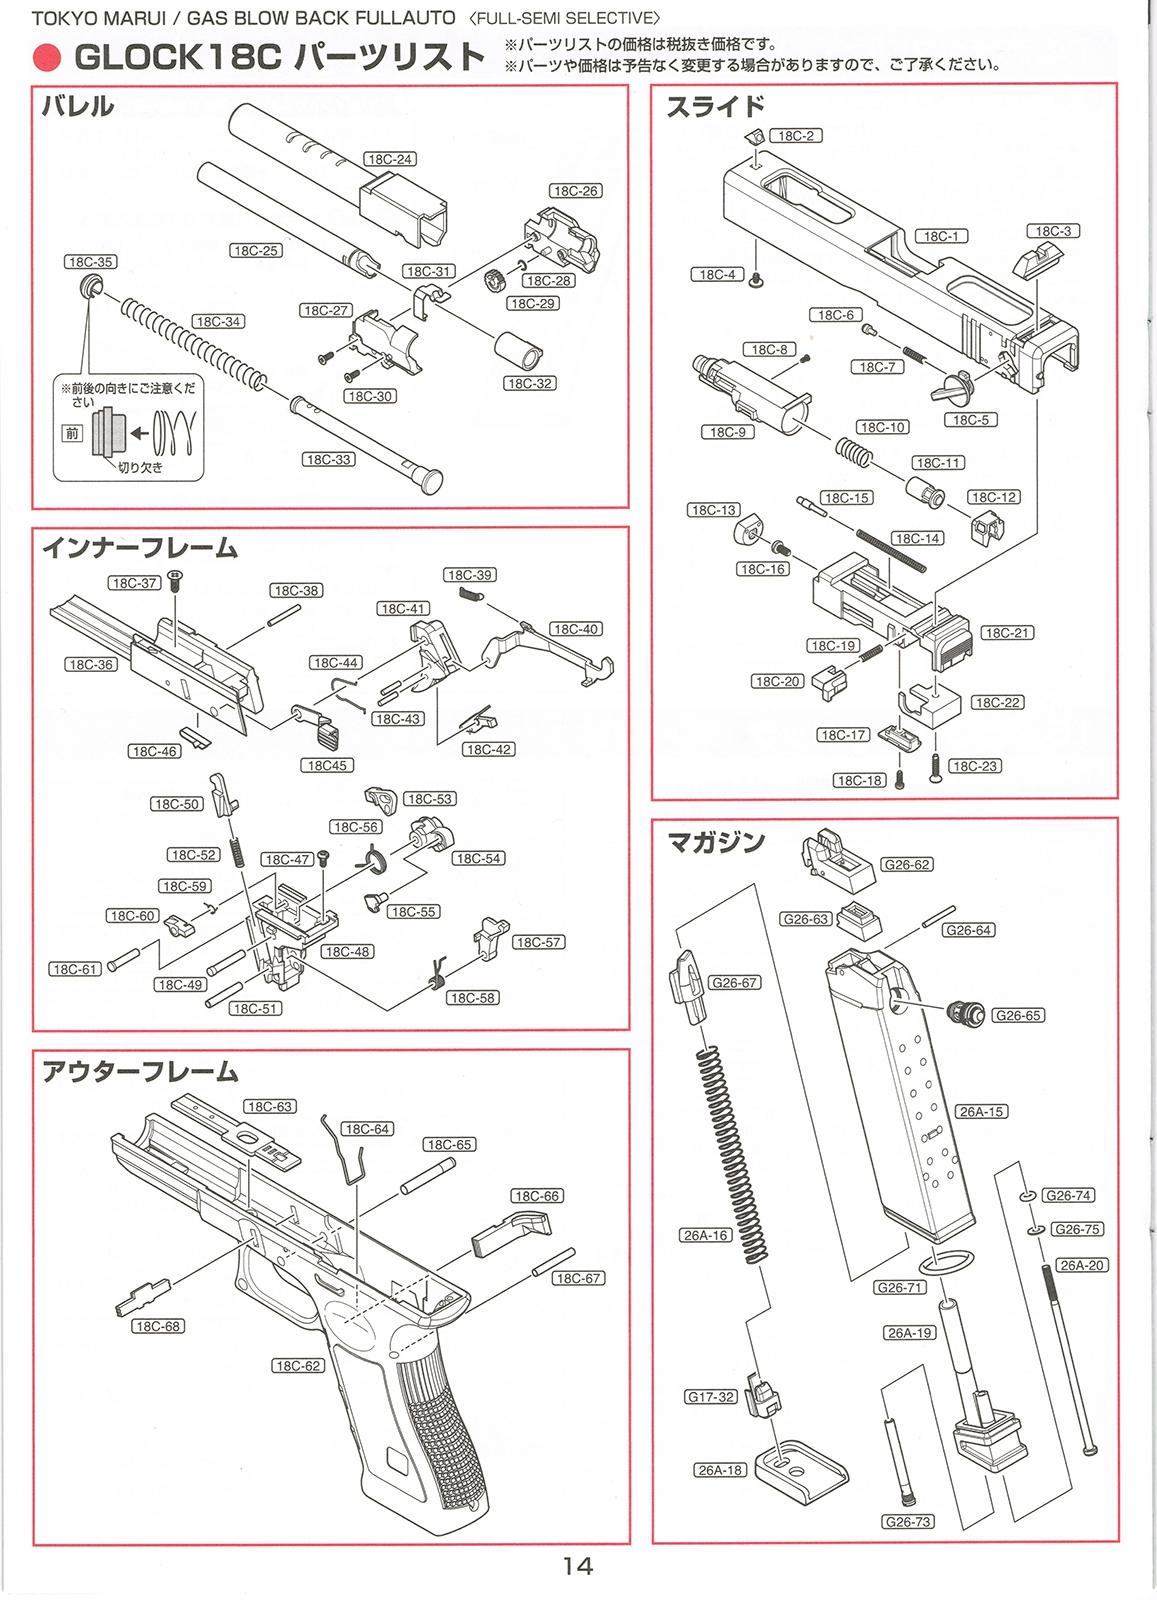 hight resolution of glock 18c gas blowback pistol parts diagram